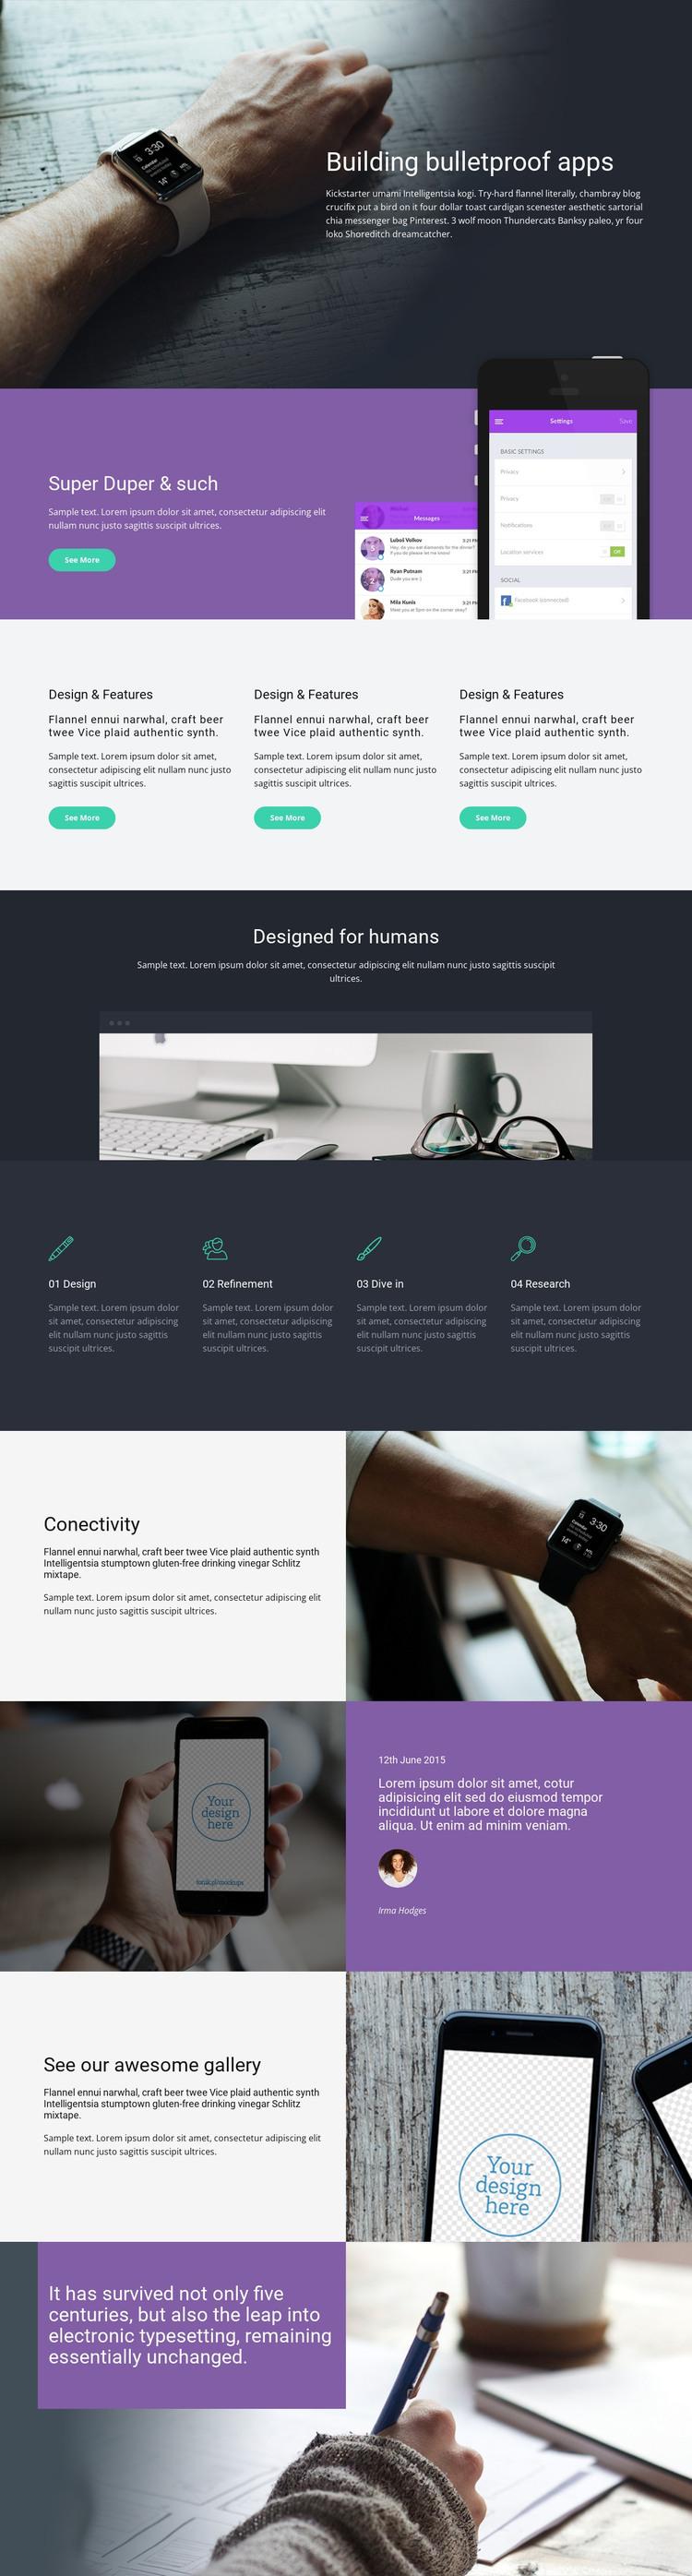 Bulletproof Apps WordPress Theme